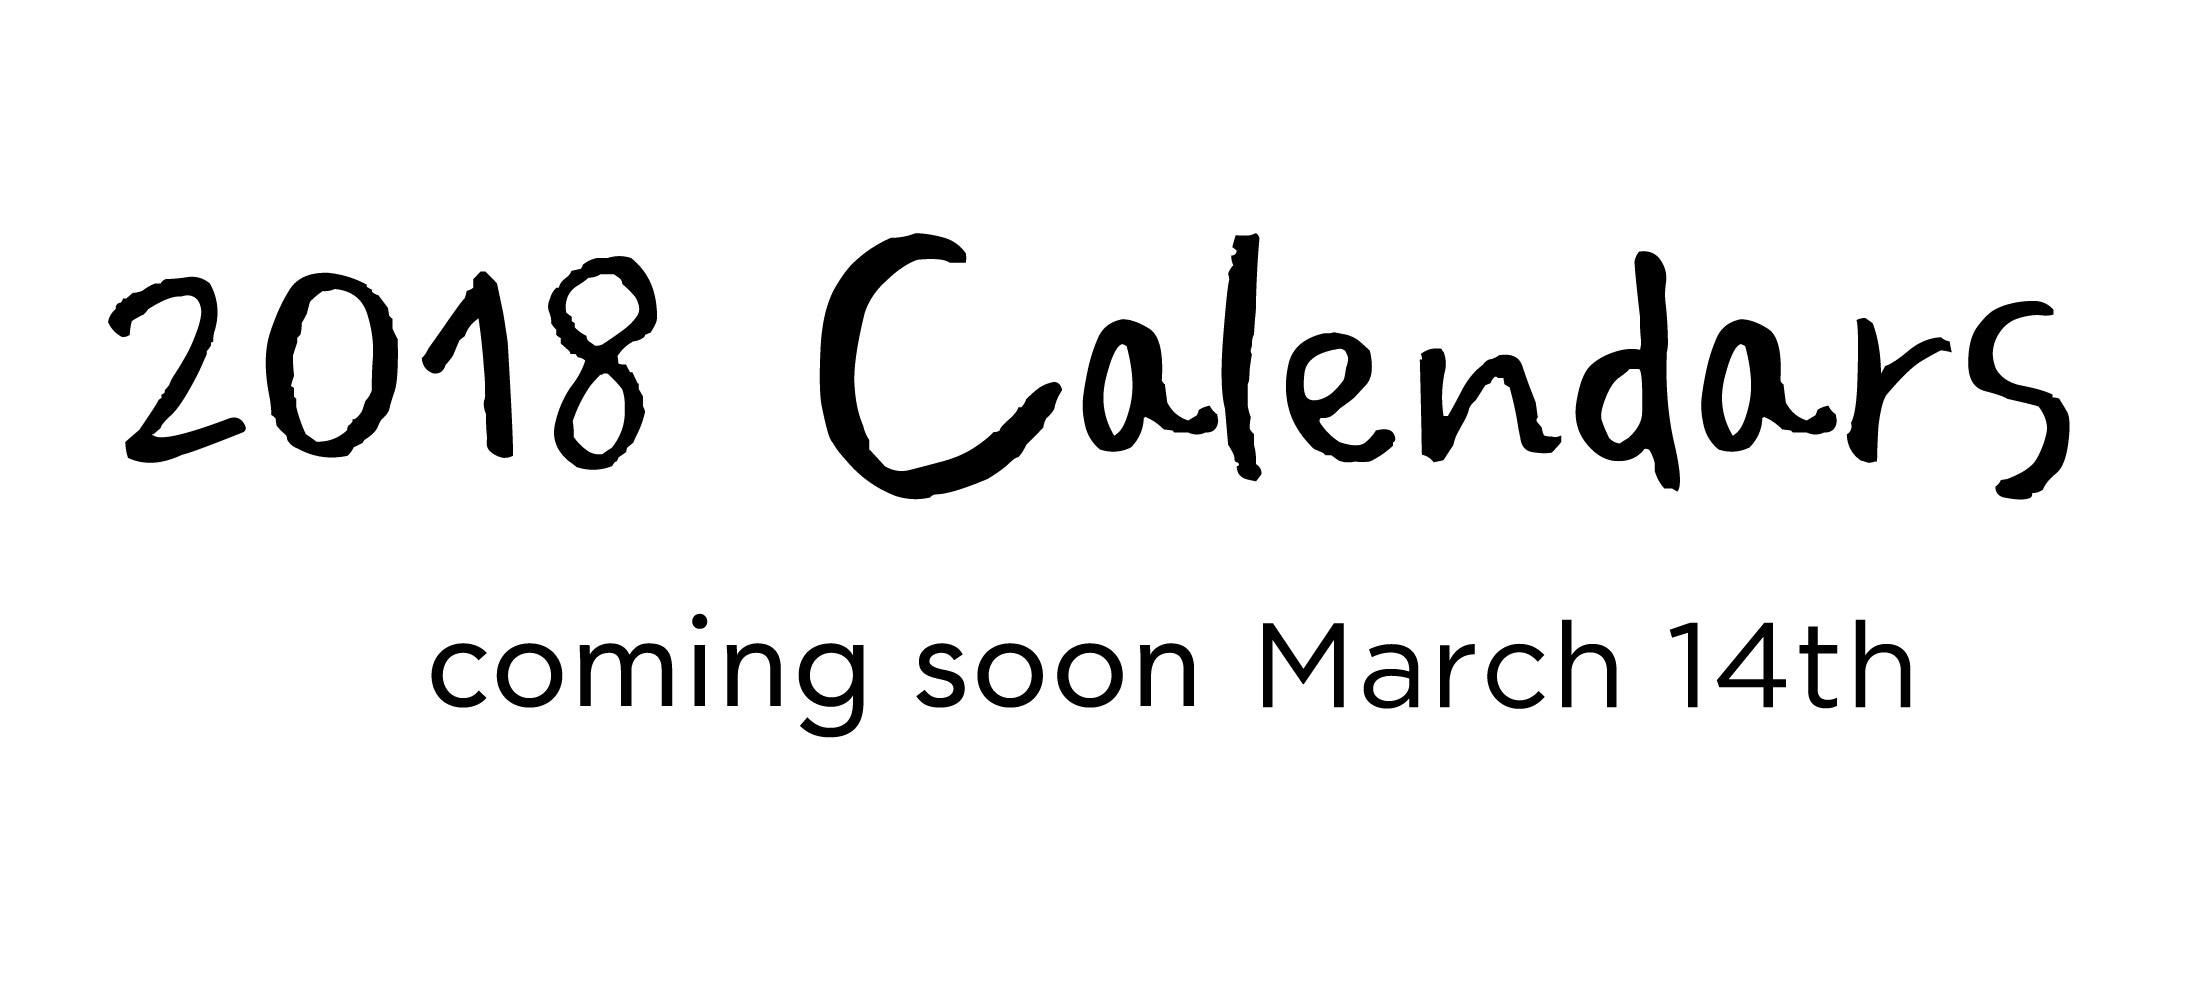 calendars-comin-soon